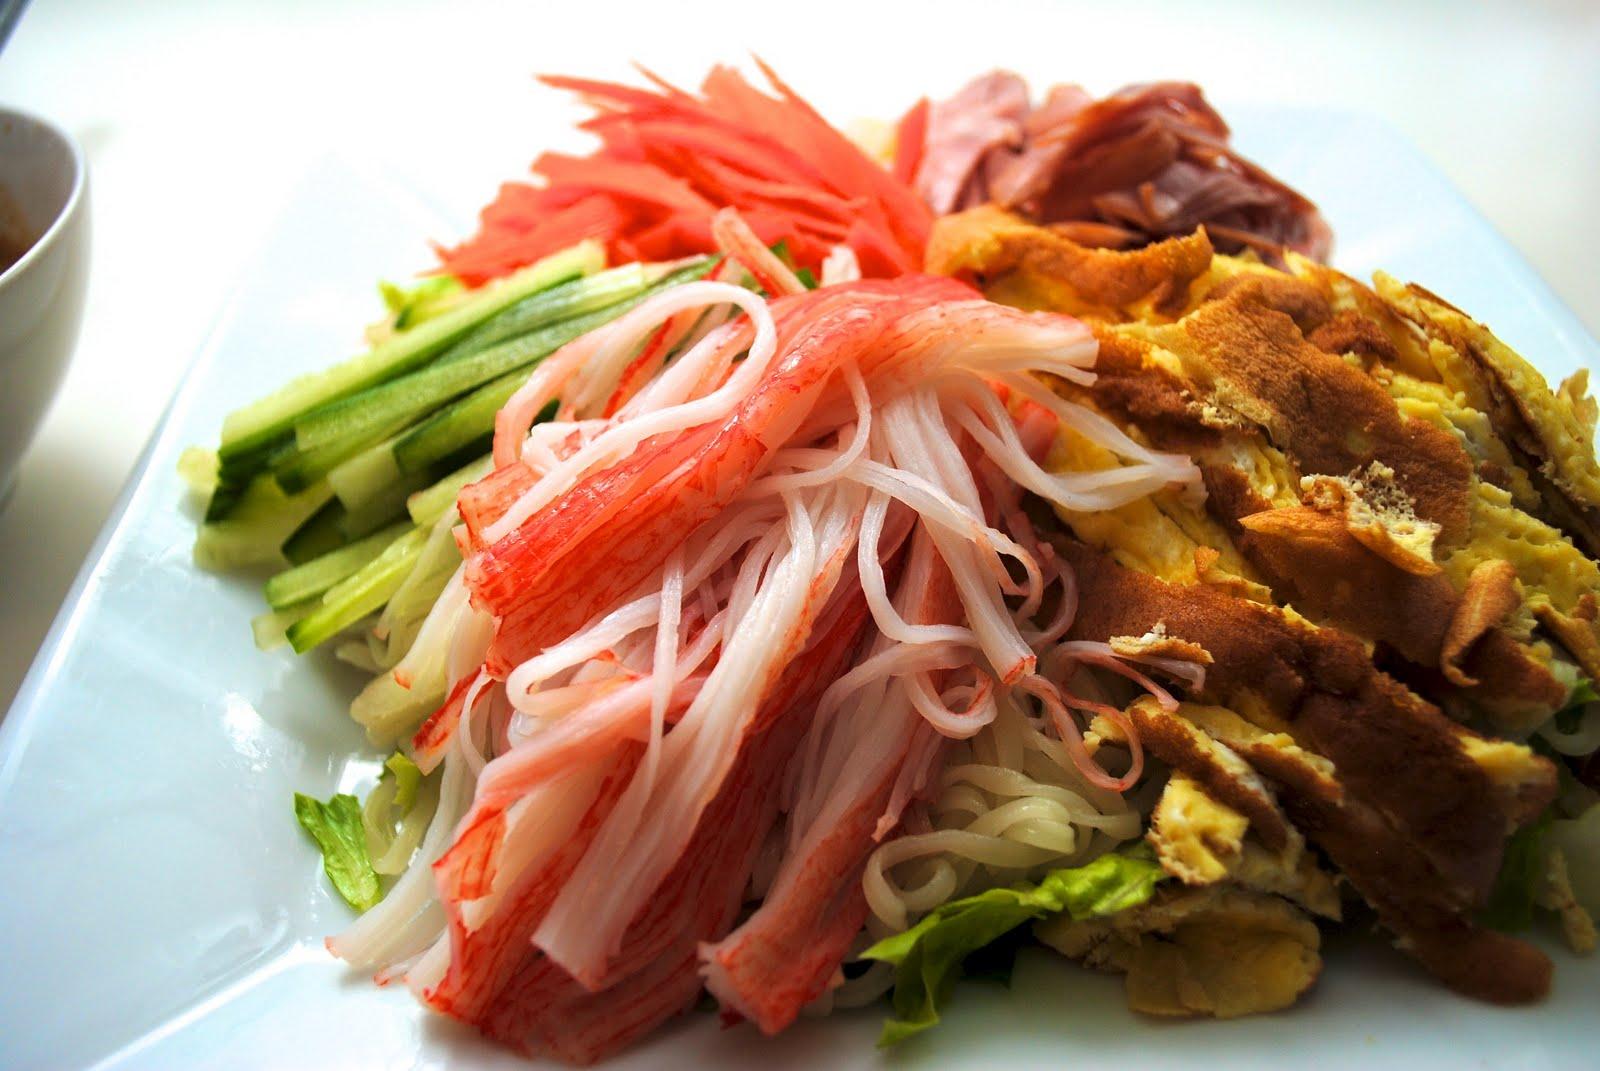 My Culinary Escape: Hiyashi Chuka- Japanese Cold Noodles